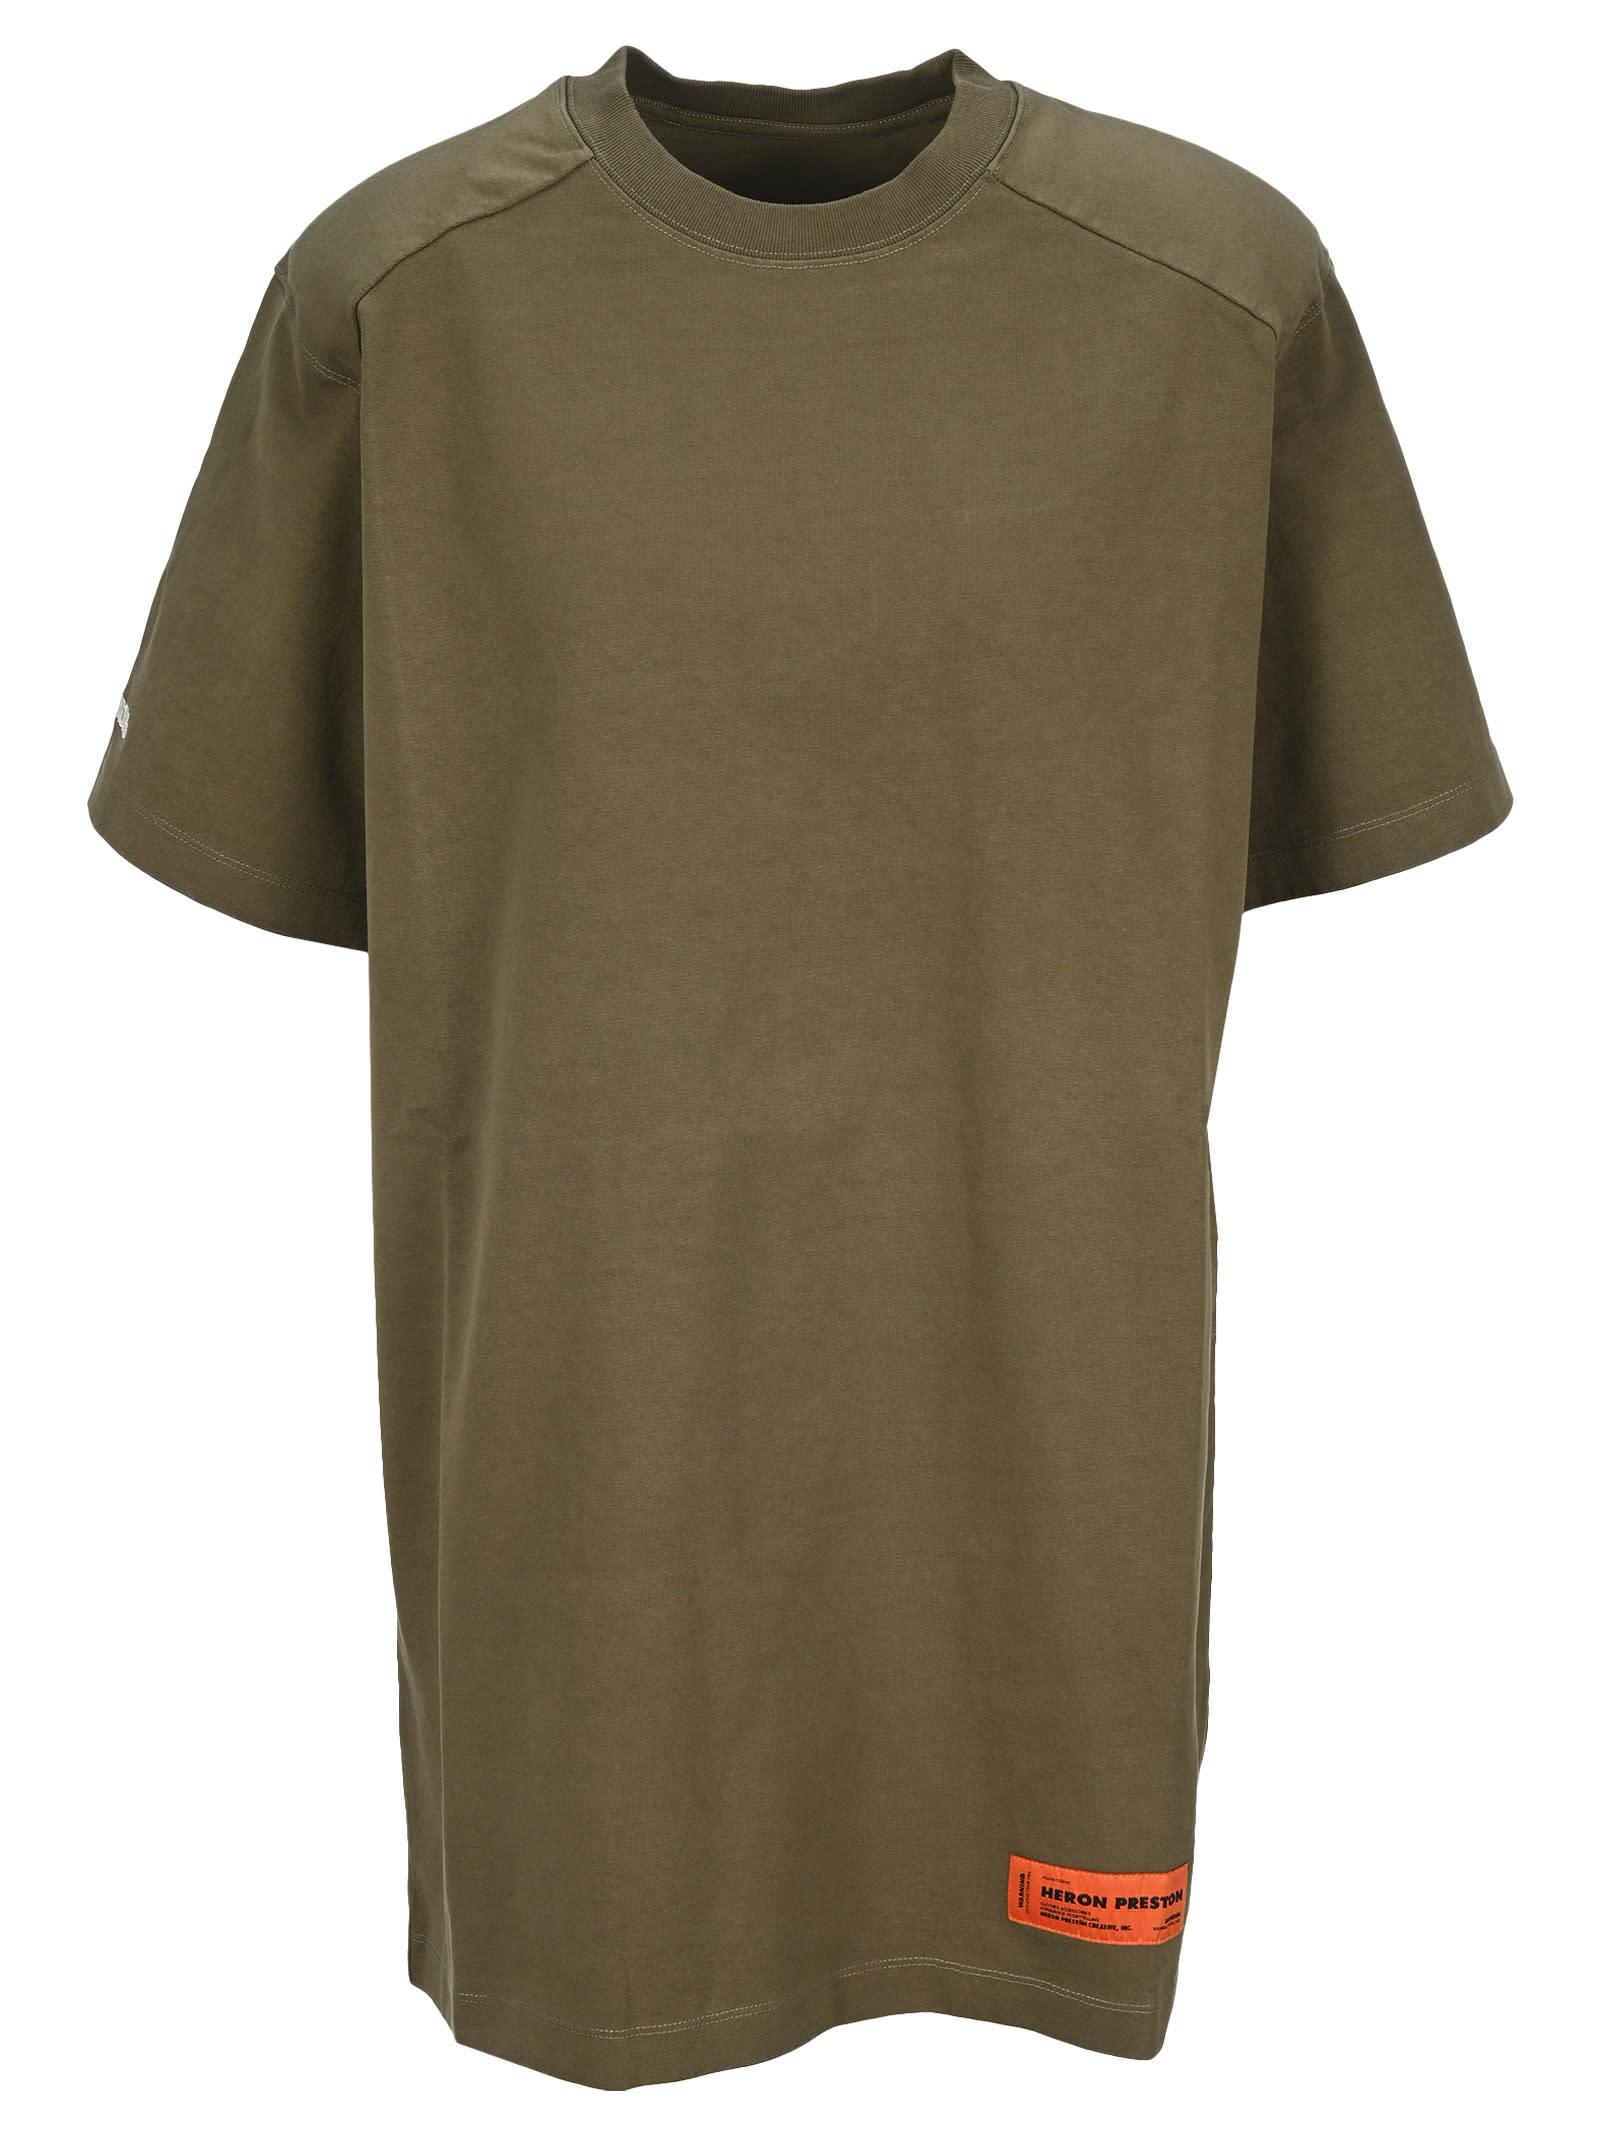 Heron Preston T-shirt Dress